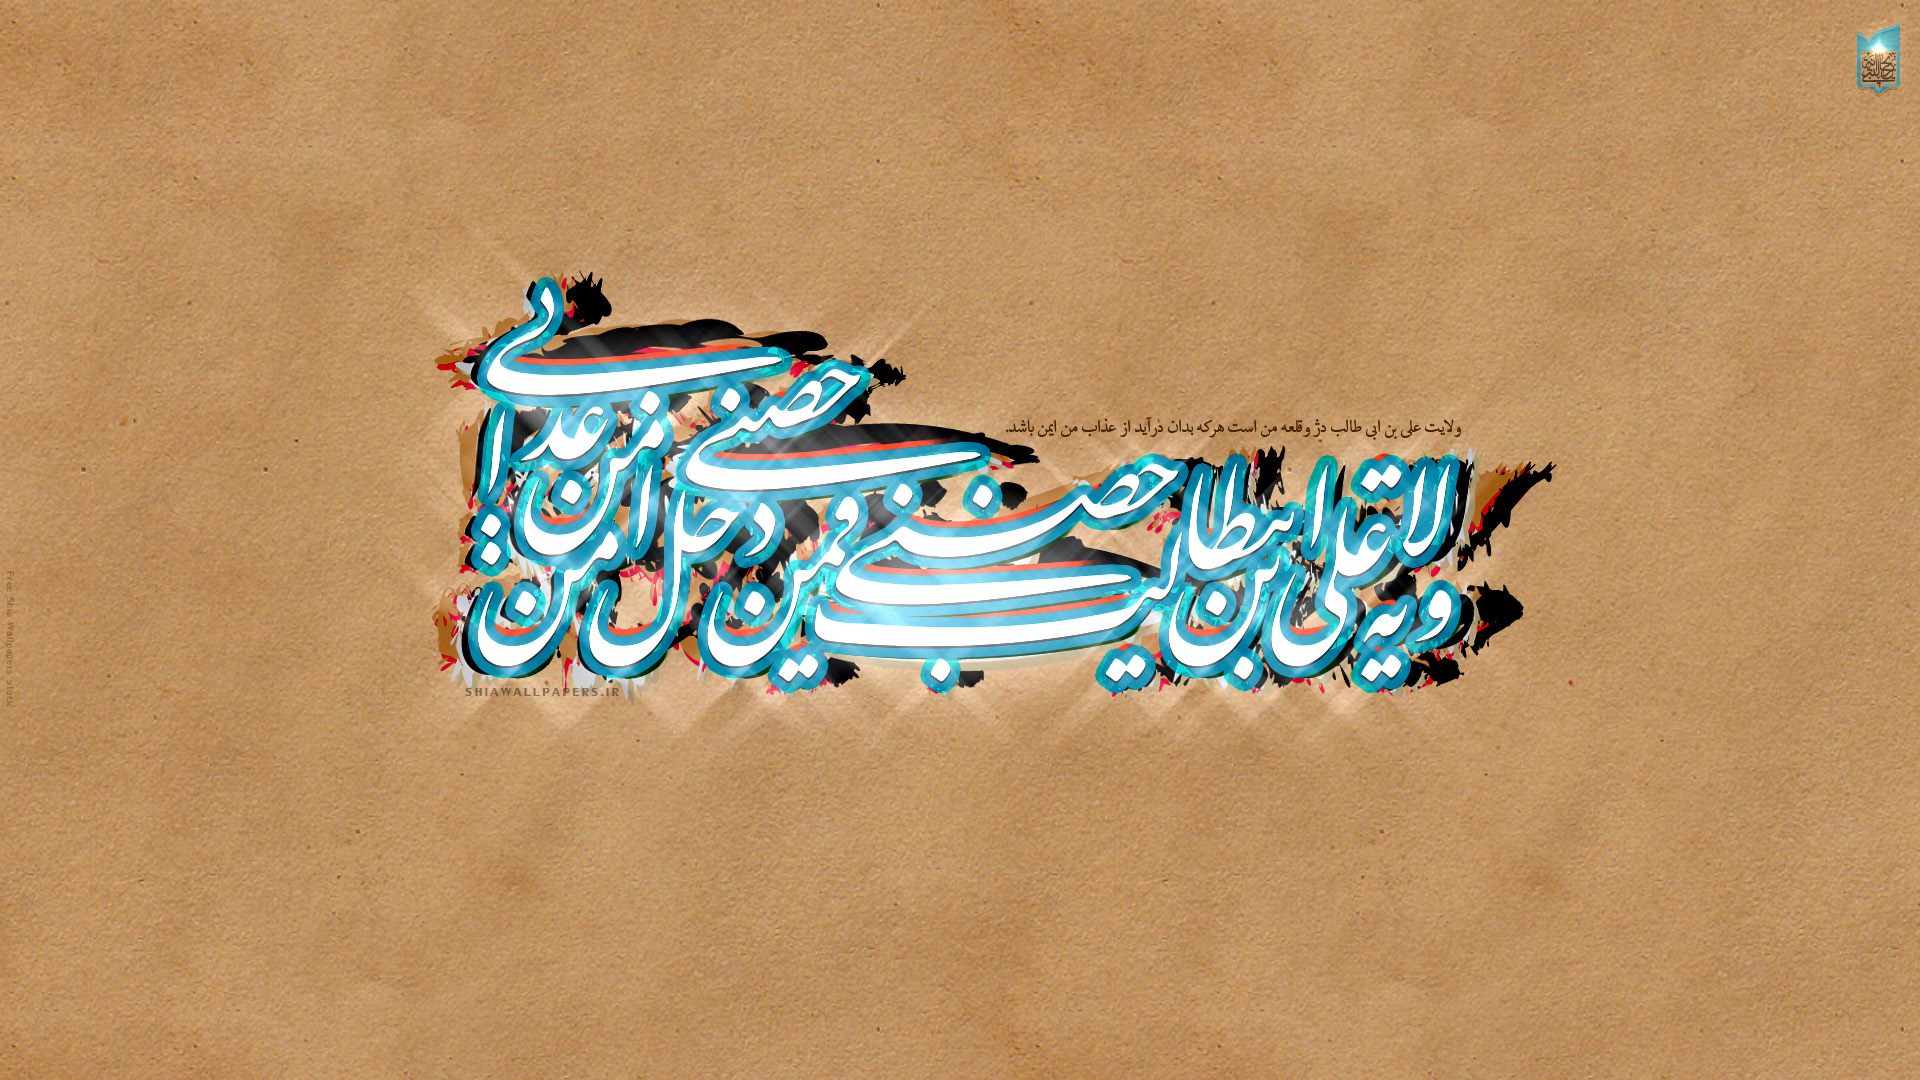 http://bachehayeghalam.ir/wp-content/uploads/2013/10/ghdir1-l.jpg